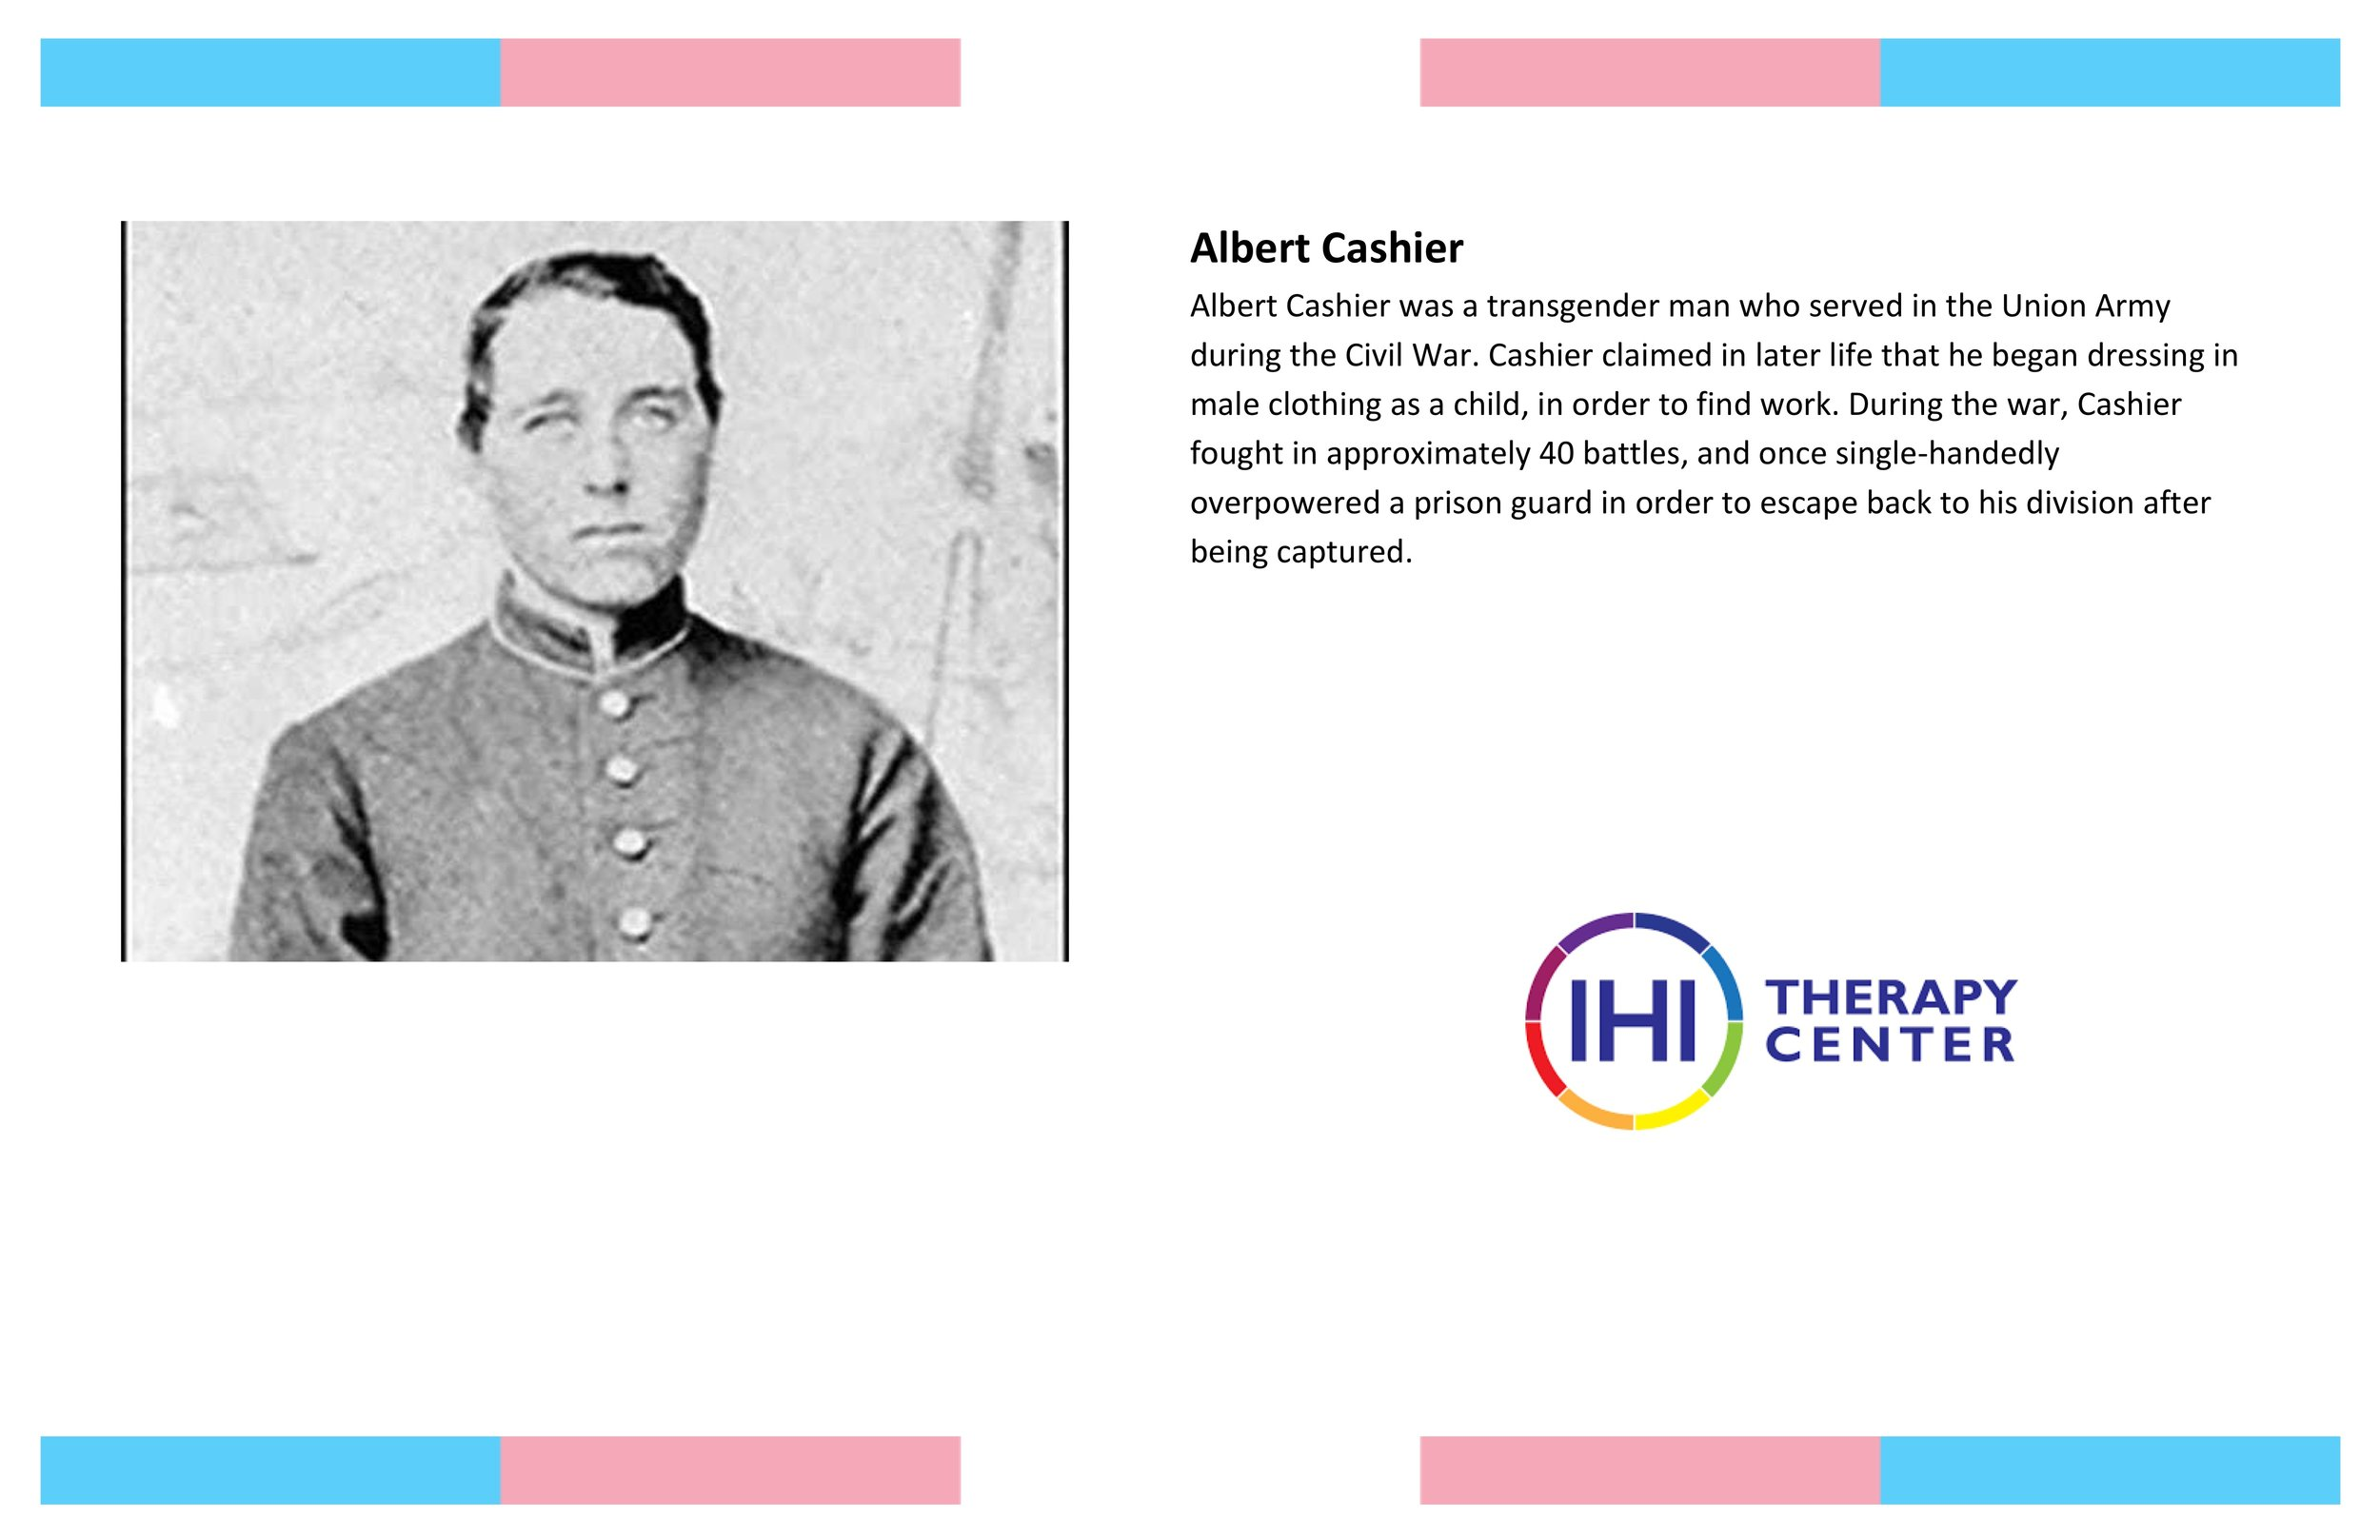 LGBTQ Pride Month Poster (Trans) 9-9.jpeg